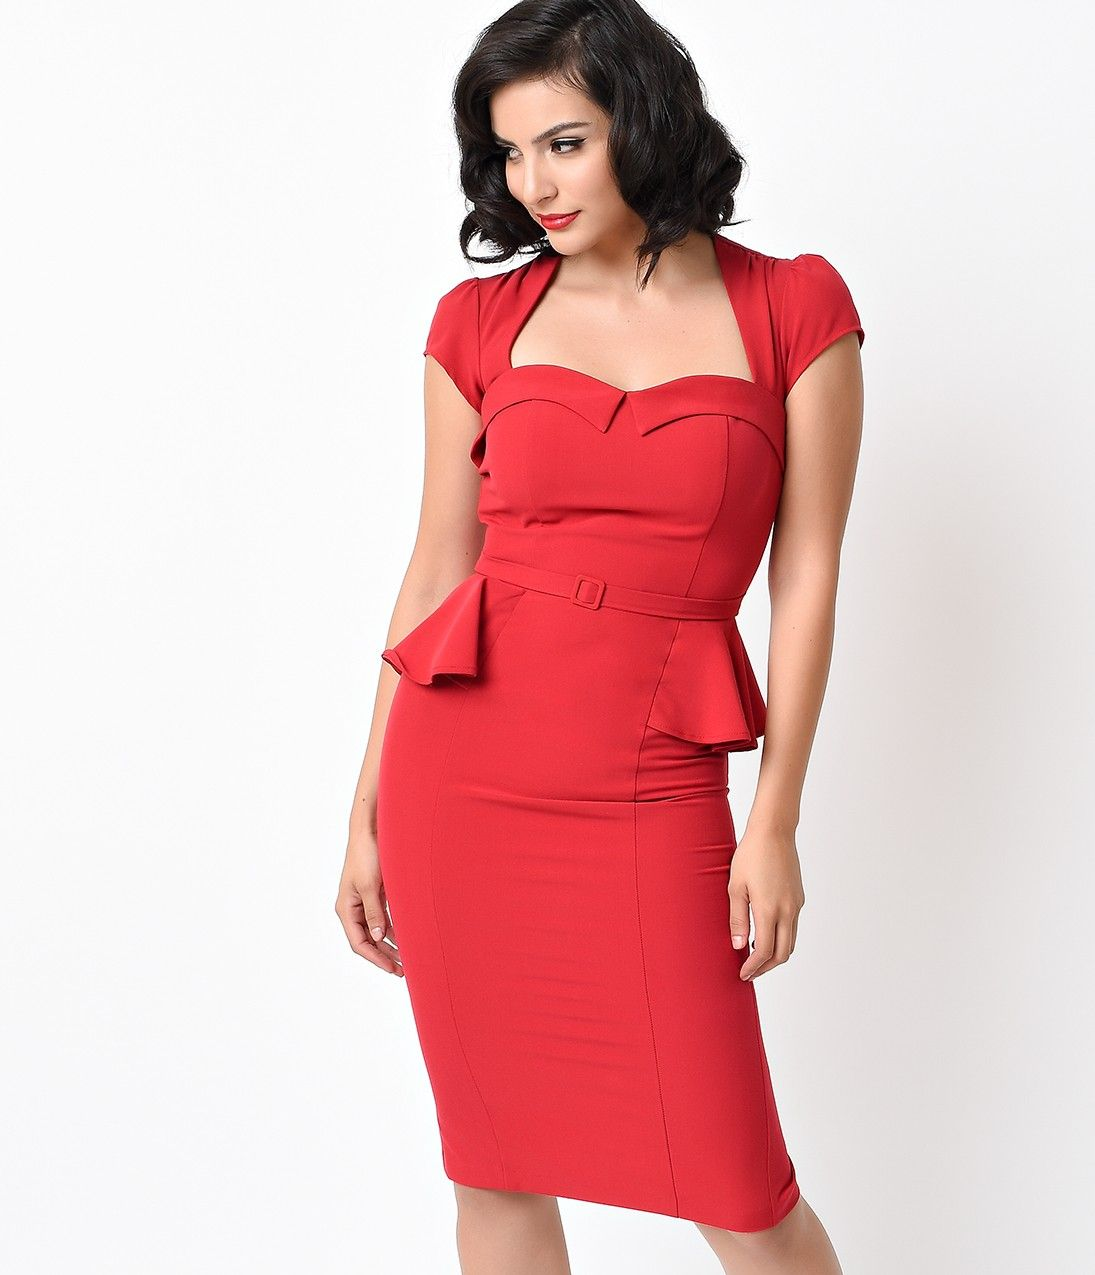 Stop Staring 1940s Style Red Bombshell Aury Peplum Wiggle Dress Kleider [ 1275 x 1095 Pixel ]